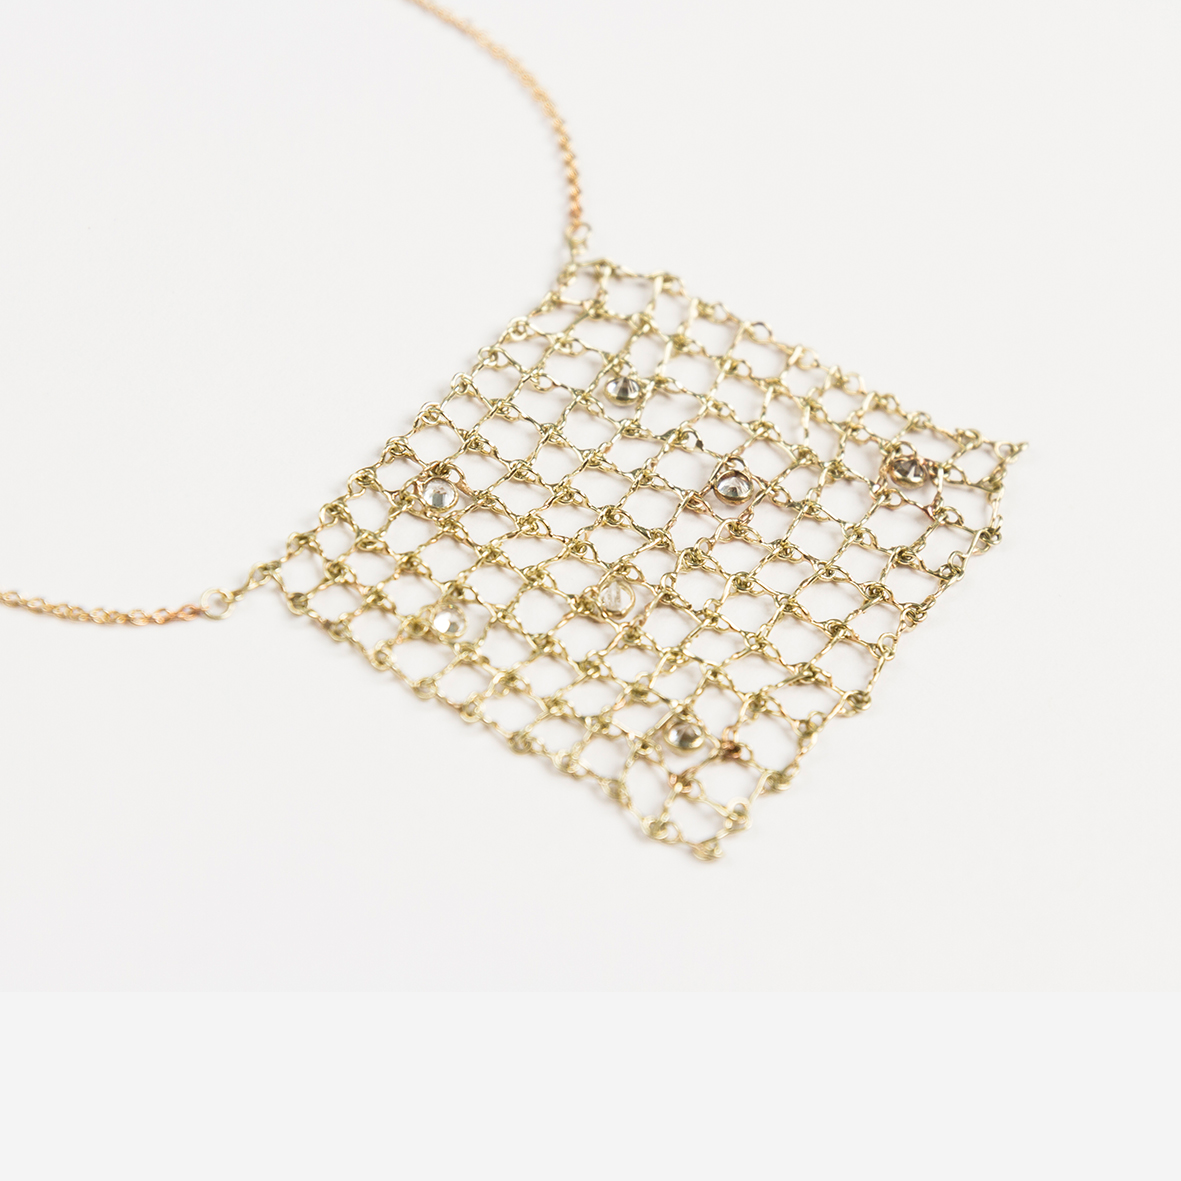 2. OONA_philo_ficha1_sapphire square net necklace